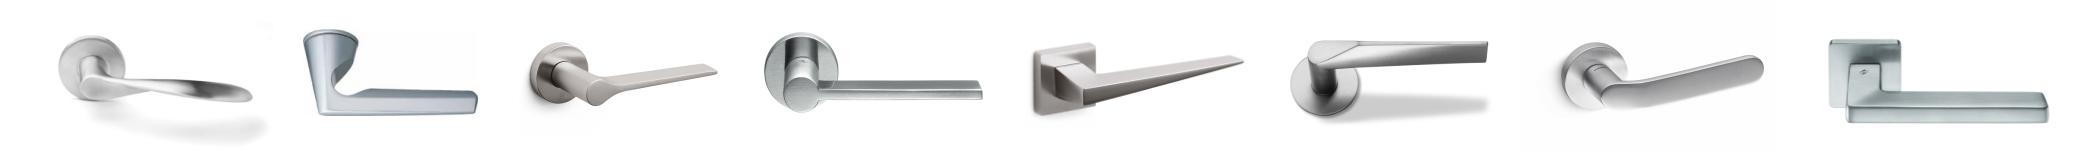 Stylish designer lever handles